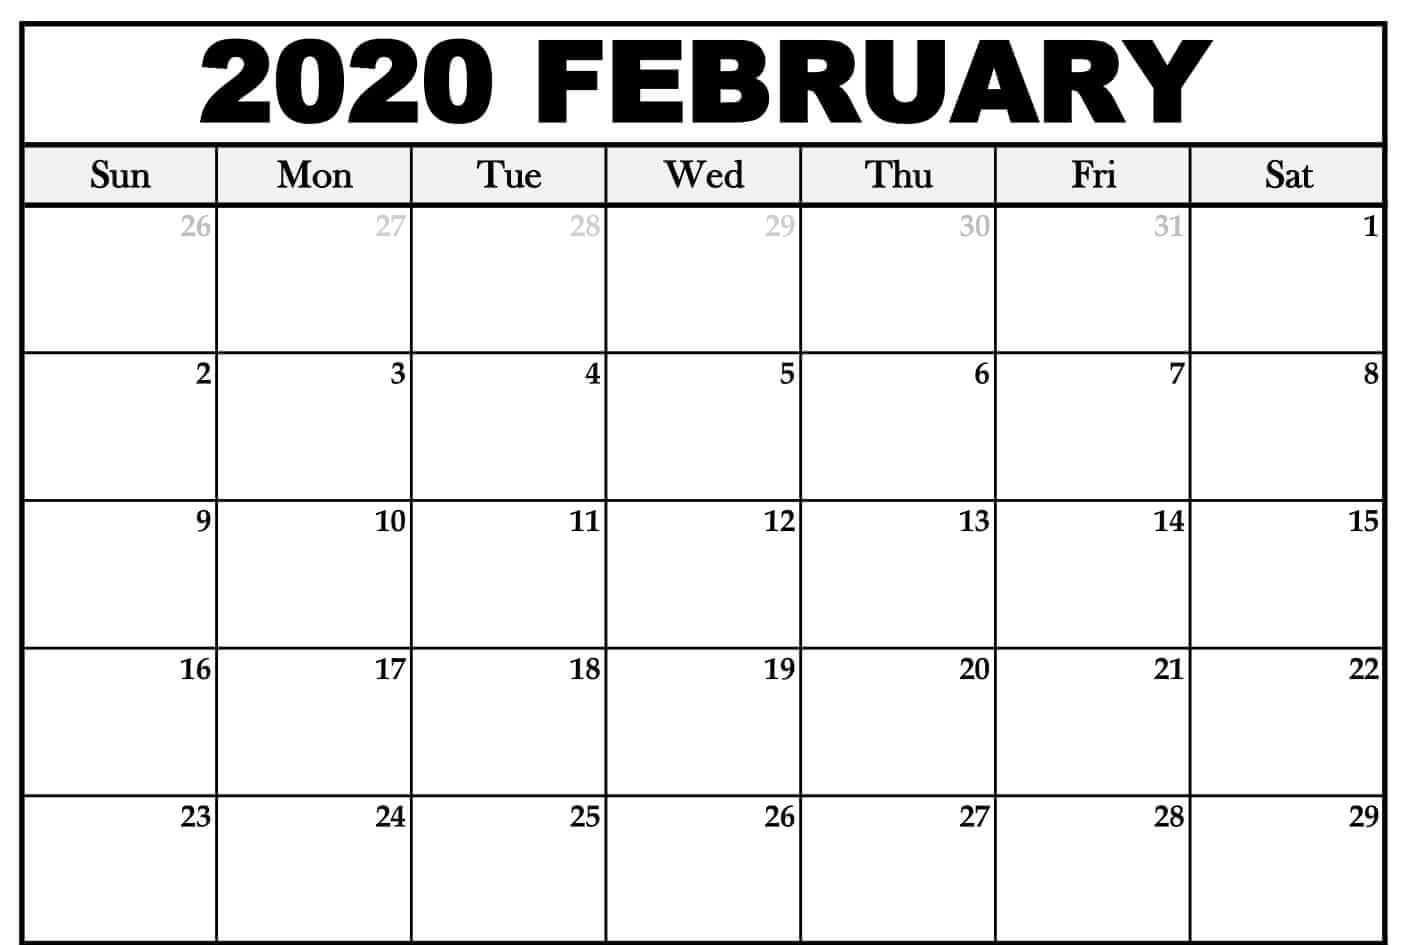 February Calendar Printable Template In Word